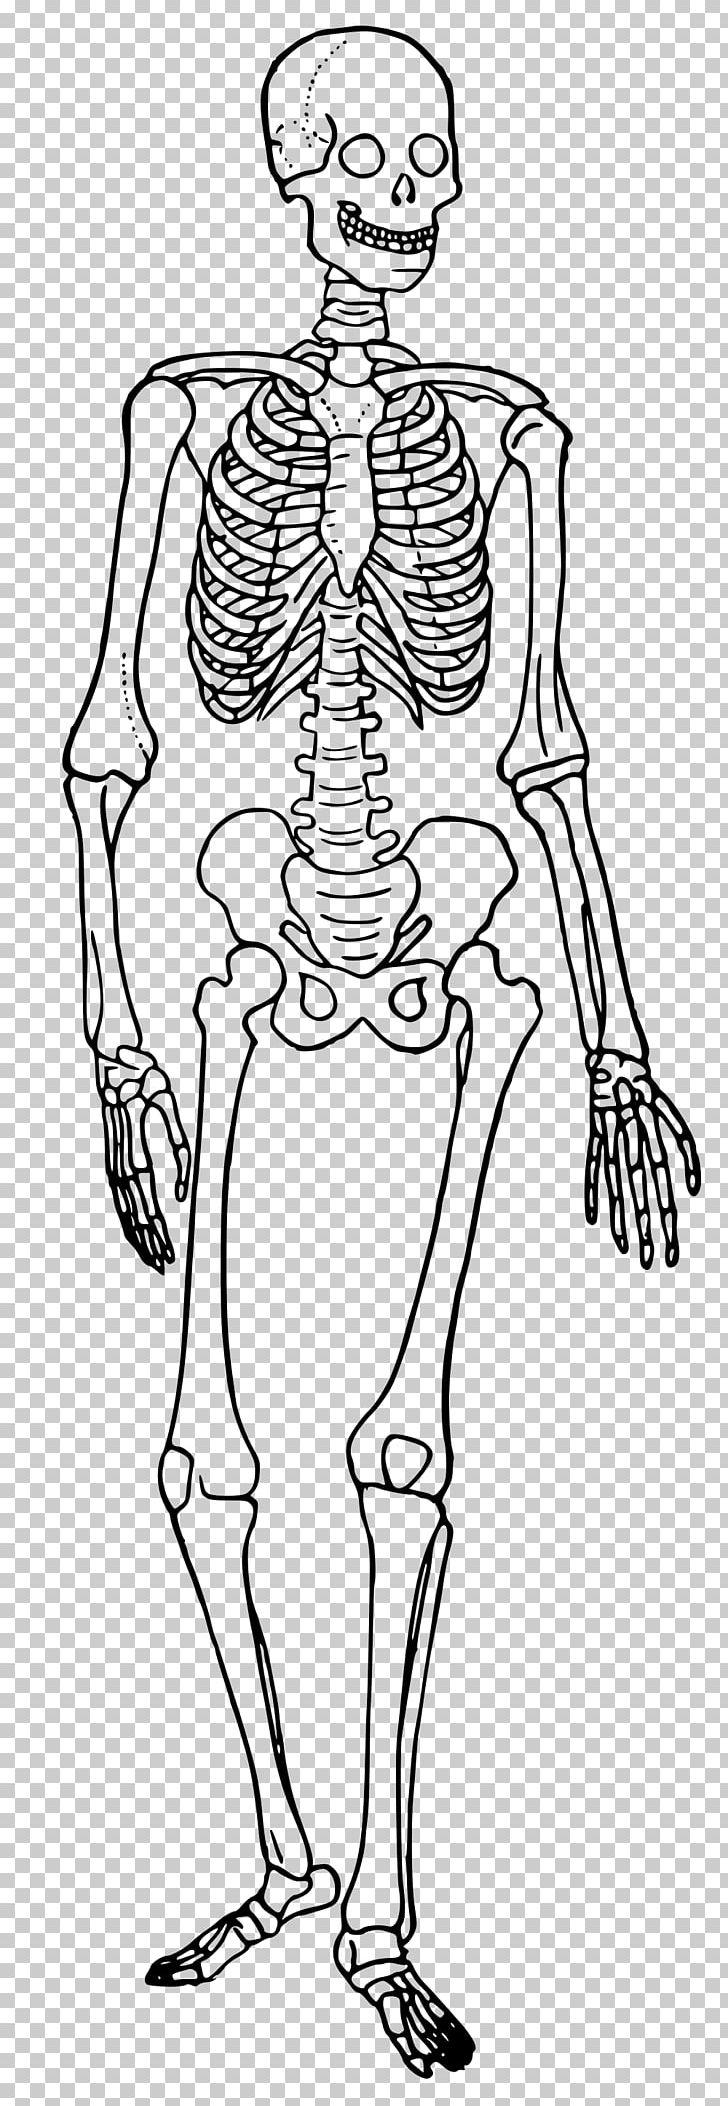 hight resolution of the skeletal system human skeleton human body diagram bone png clipart anatomy arm art